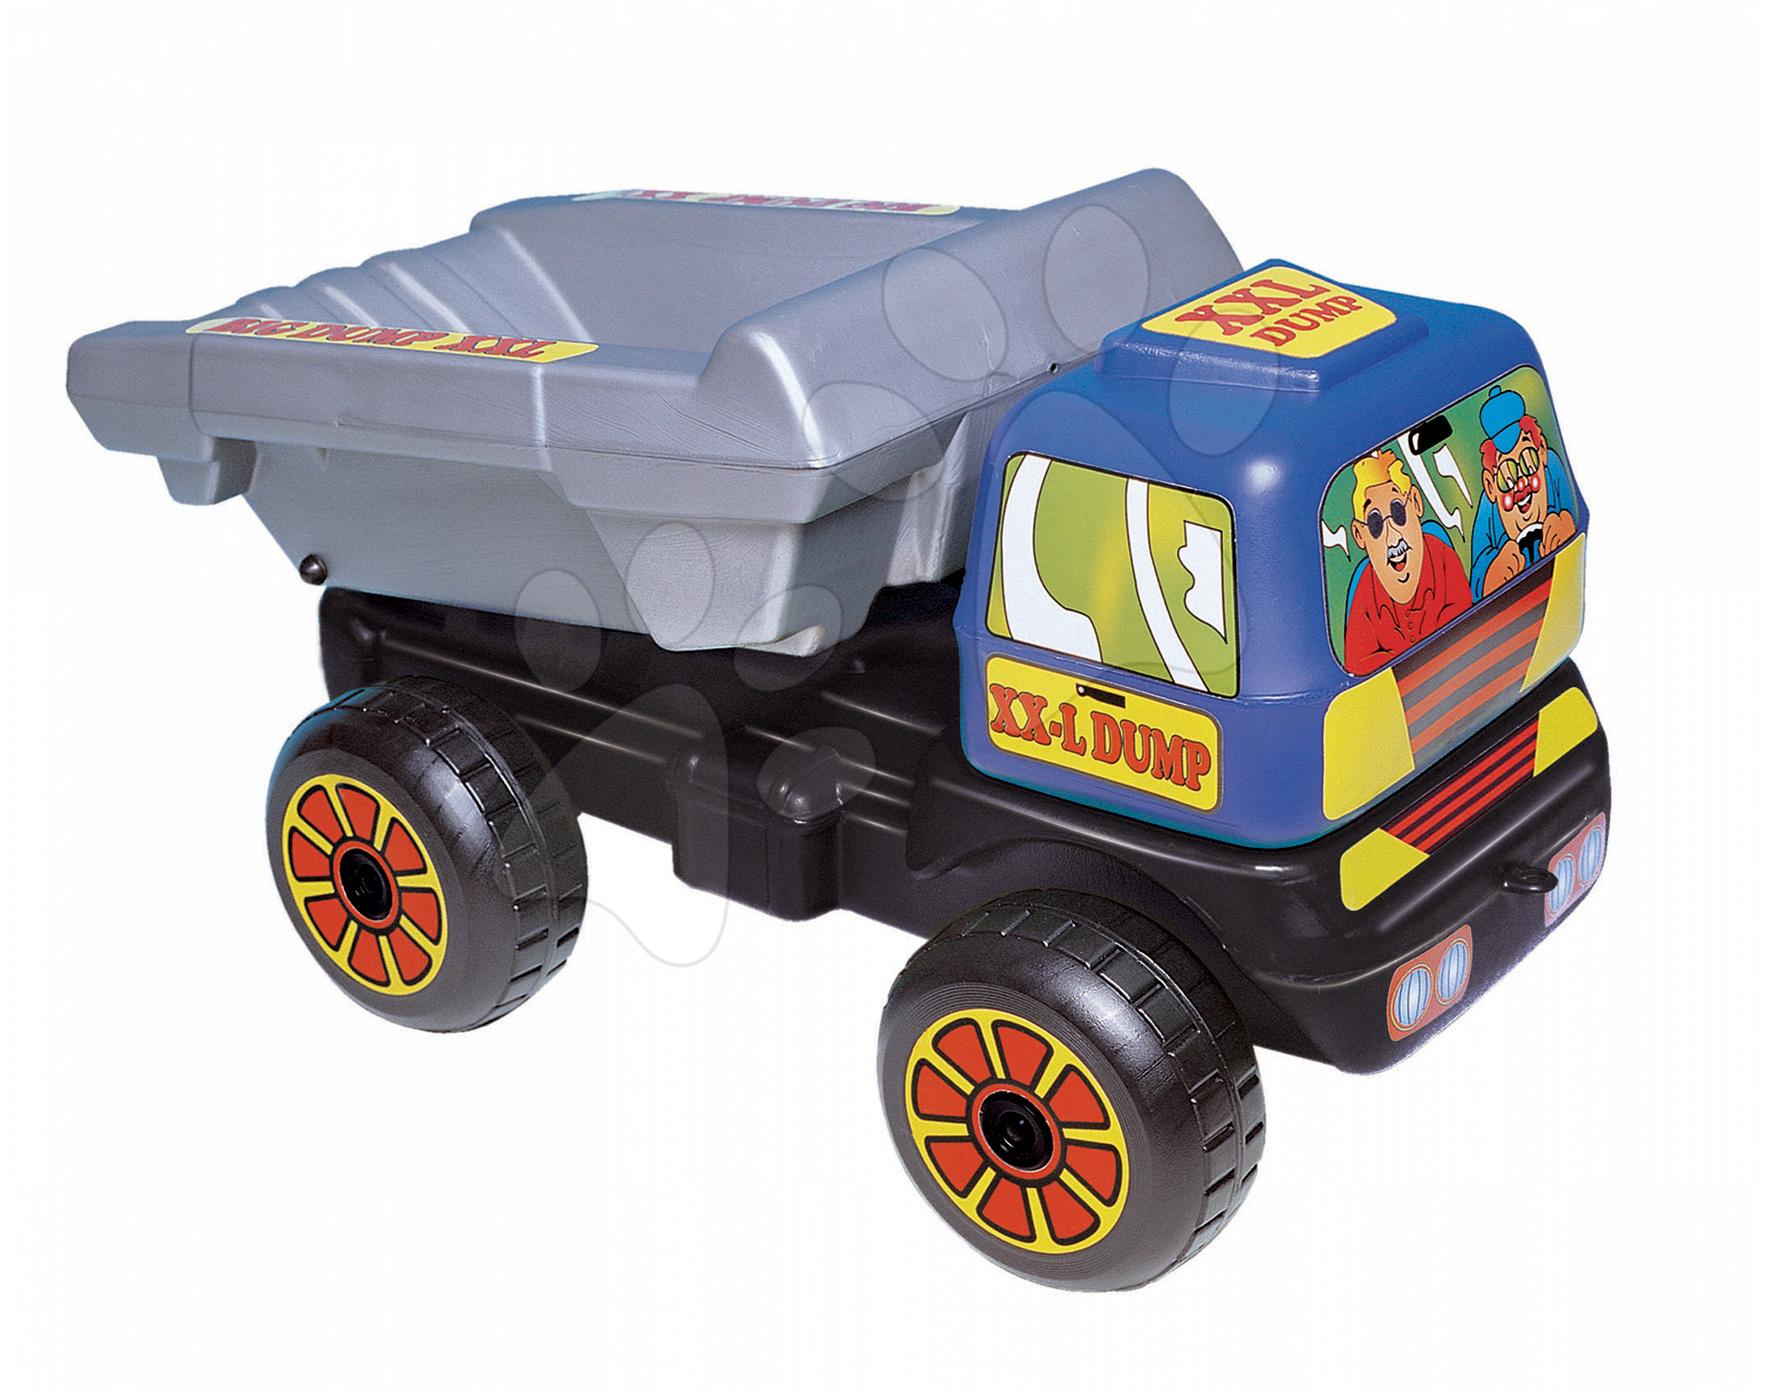 Tovornjaki - Prekucnik XXL Dohány z dvojno steno dolžina 78 cm